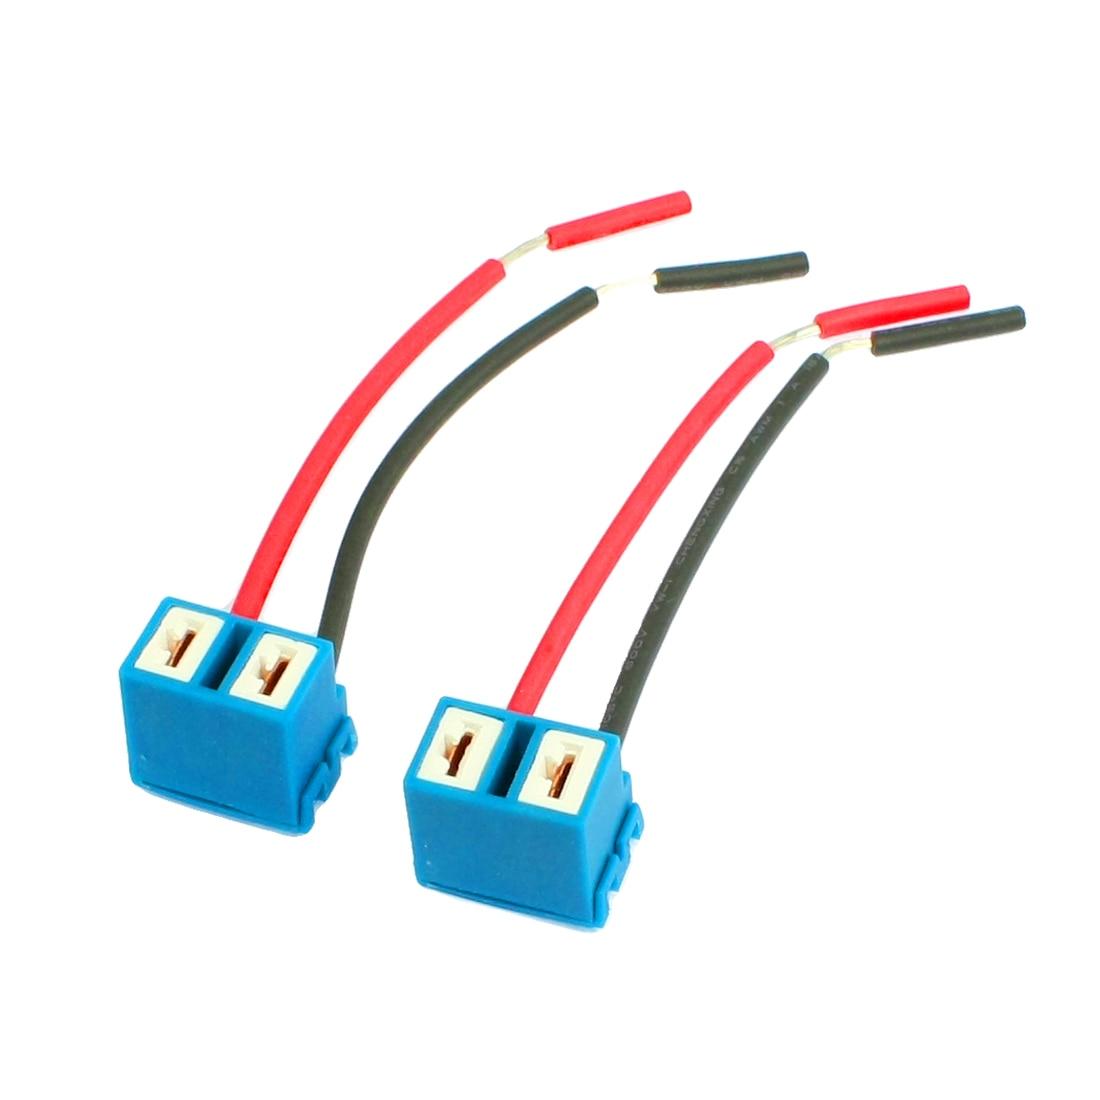 X autohaux 2 pçs tomada angular h7 extensão cerâmica farol lâmpada conector wirings arnês